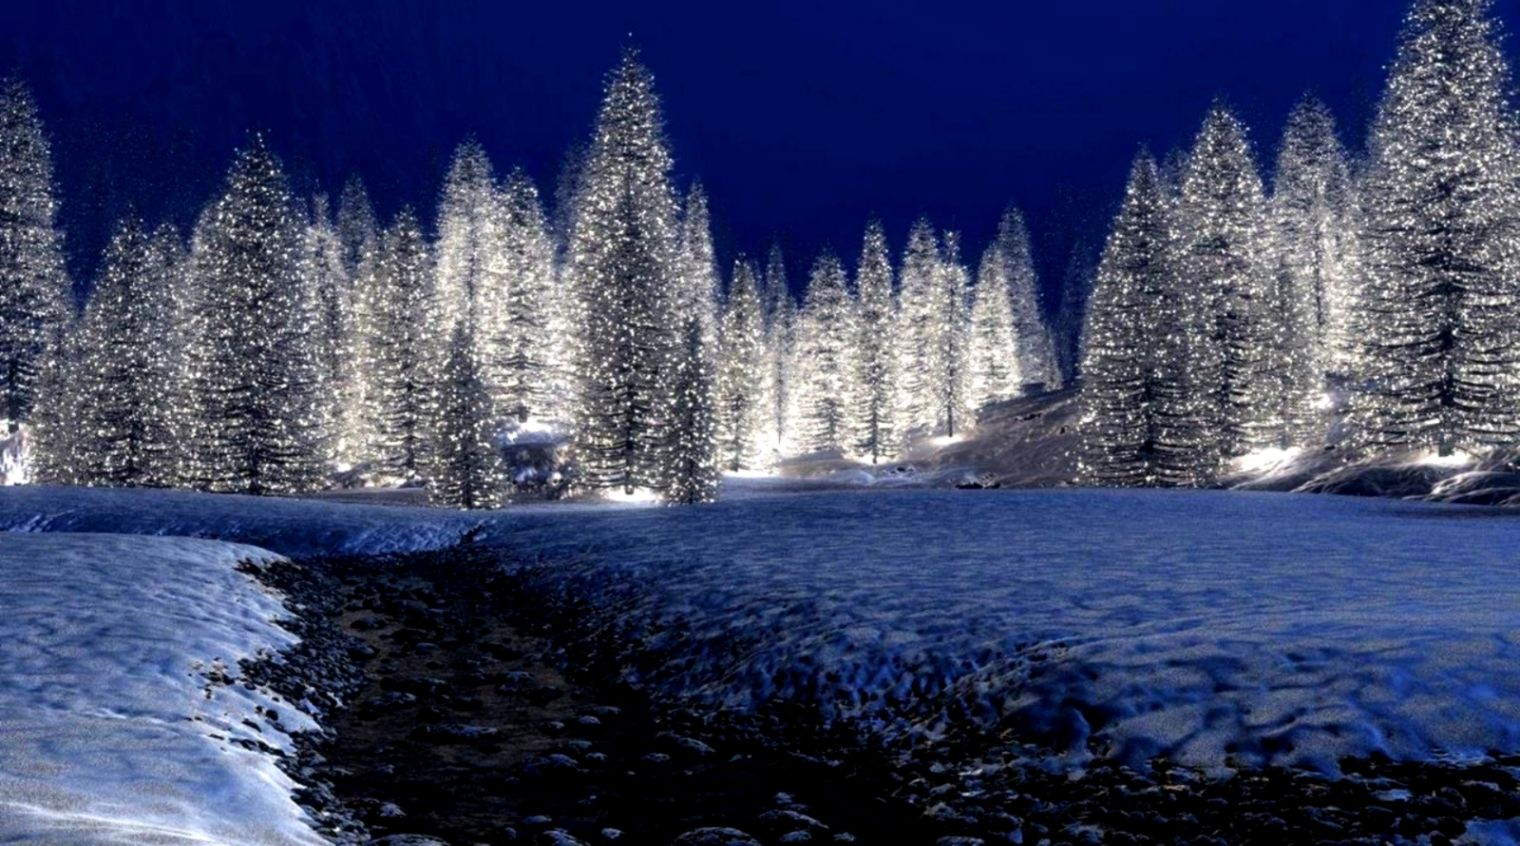 winter night christmas snow trees forest lights wallpaper full hd